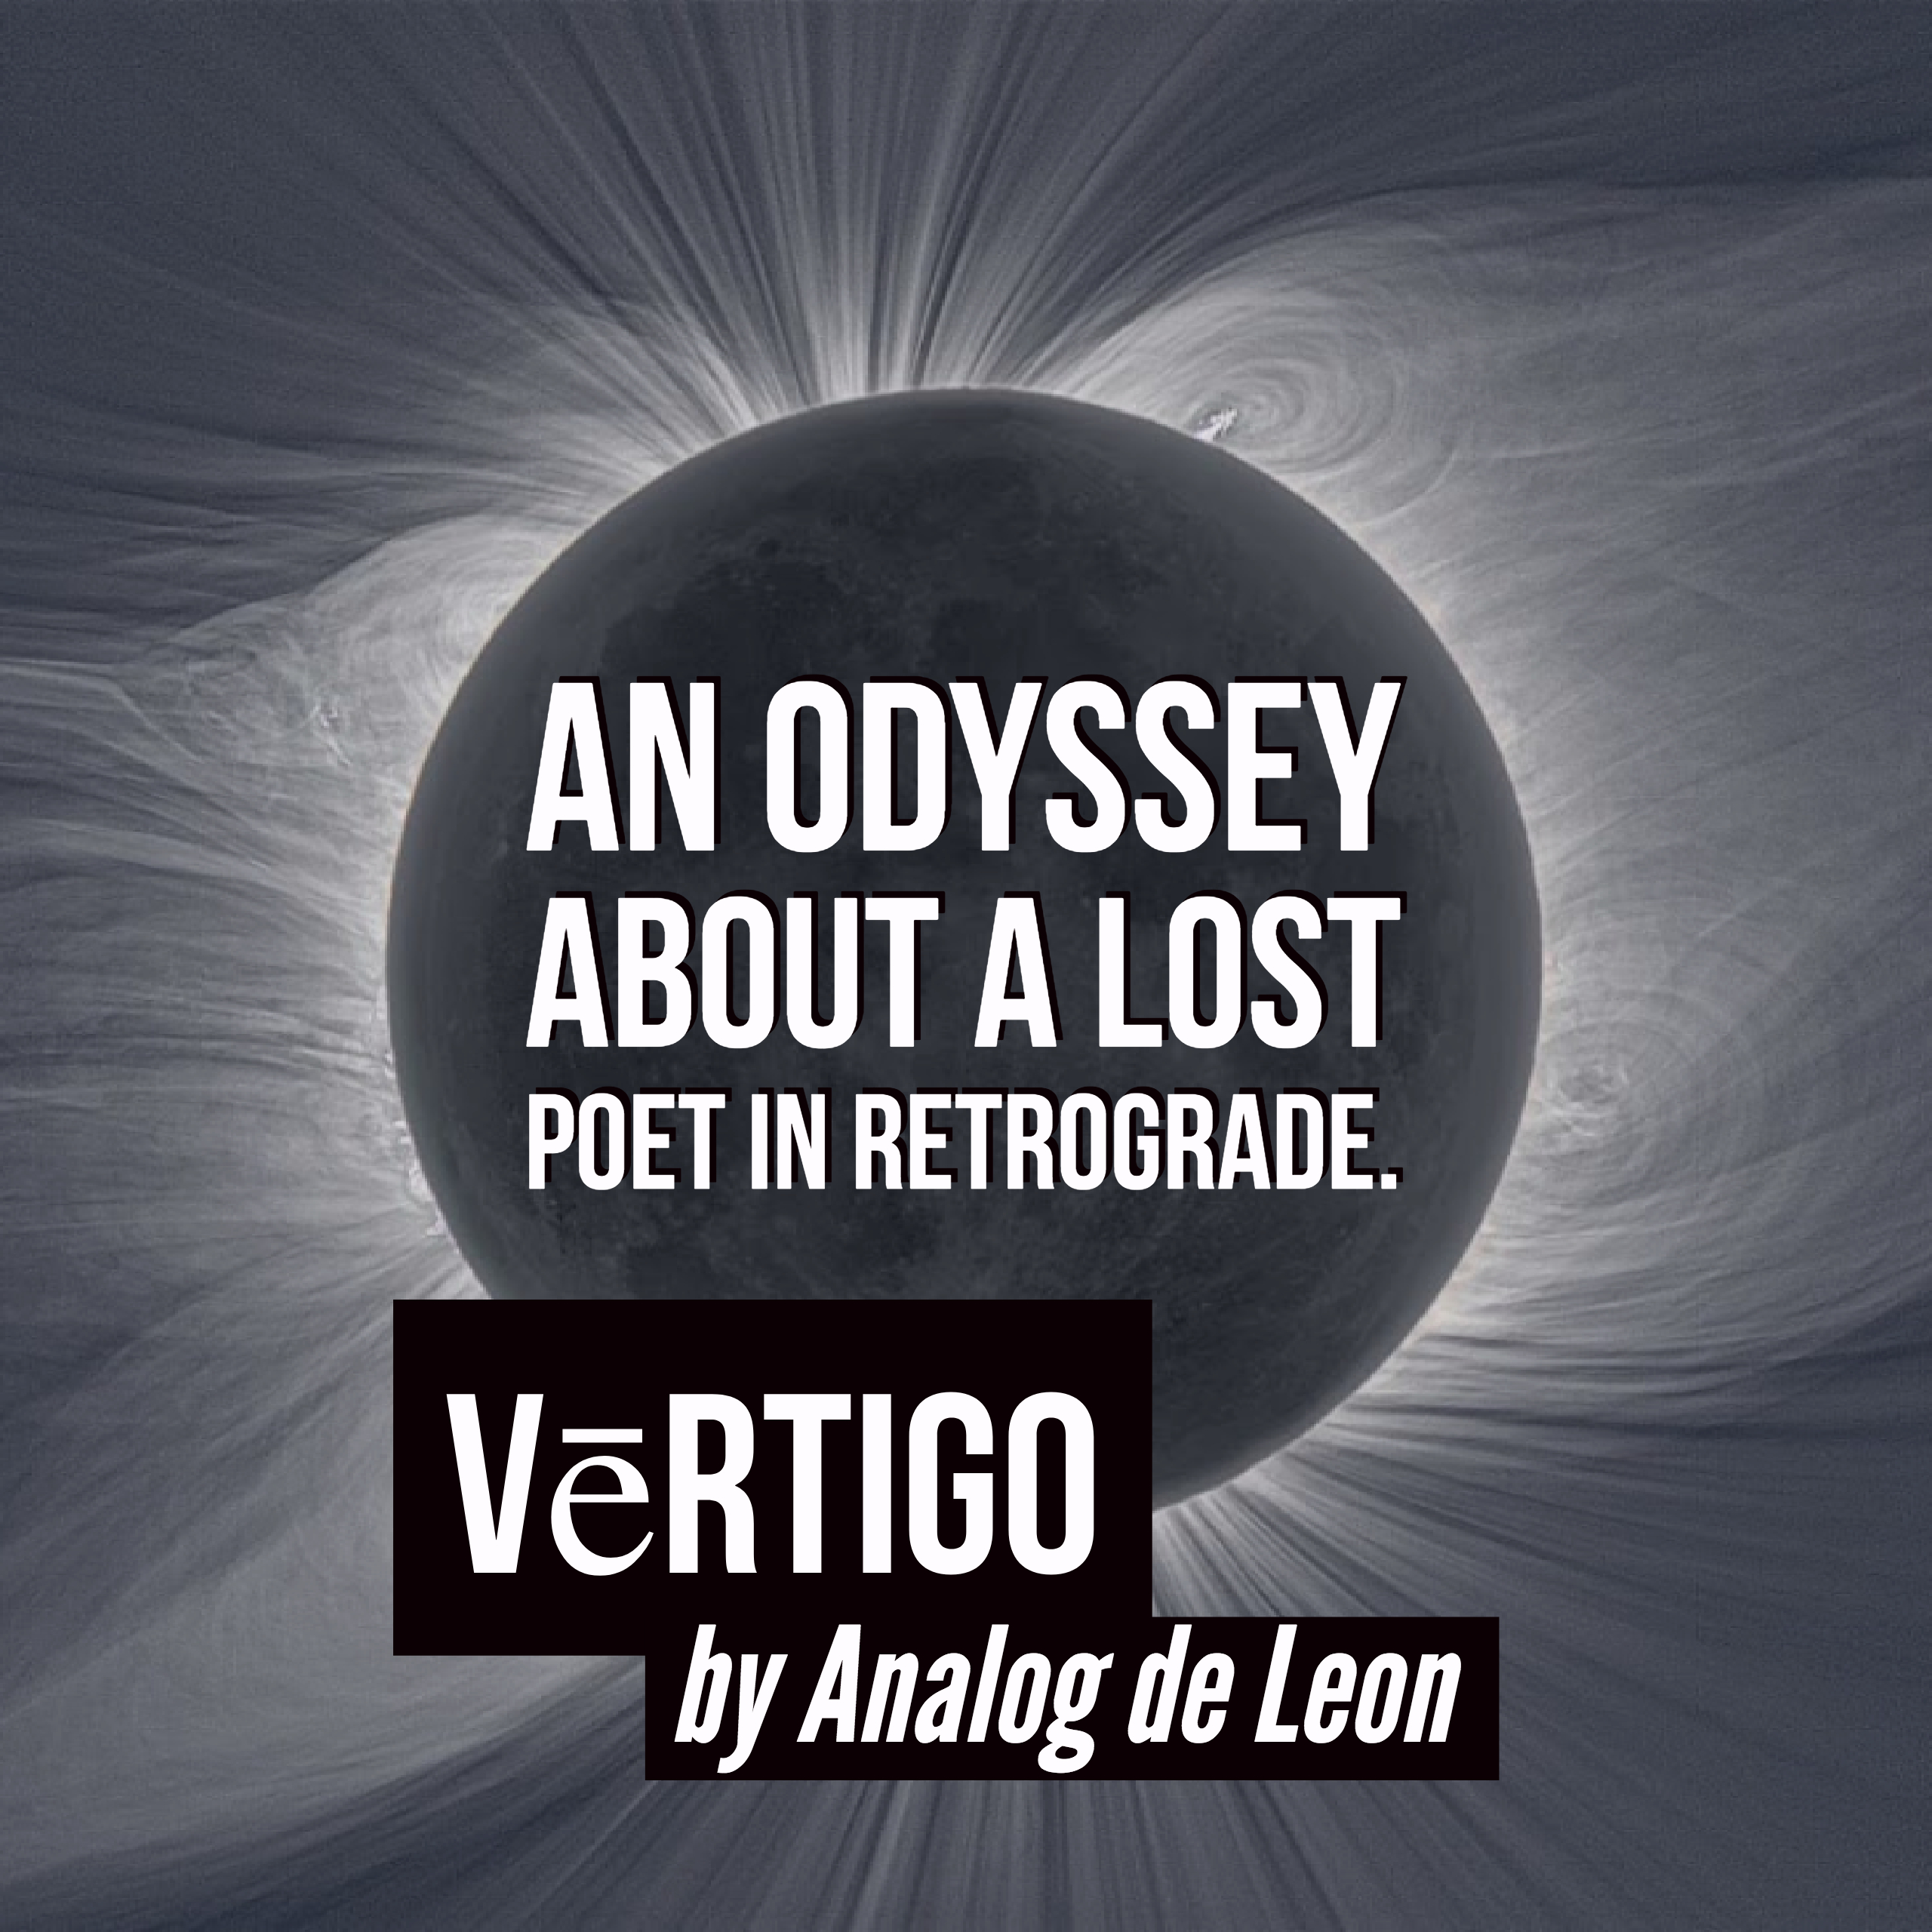 poems poet Analog de leon poetry vertigo chris purifoy love resist lost poets